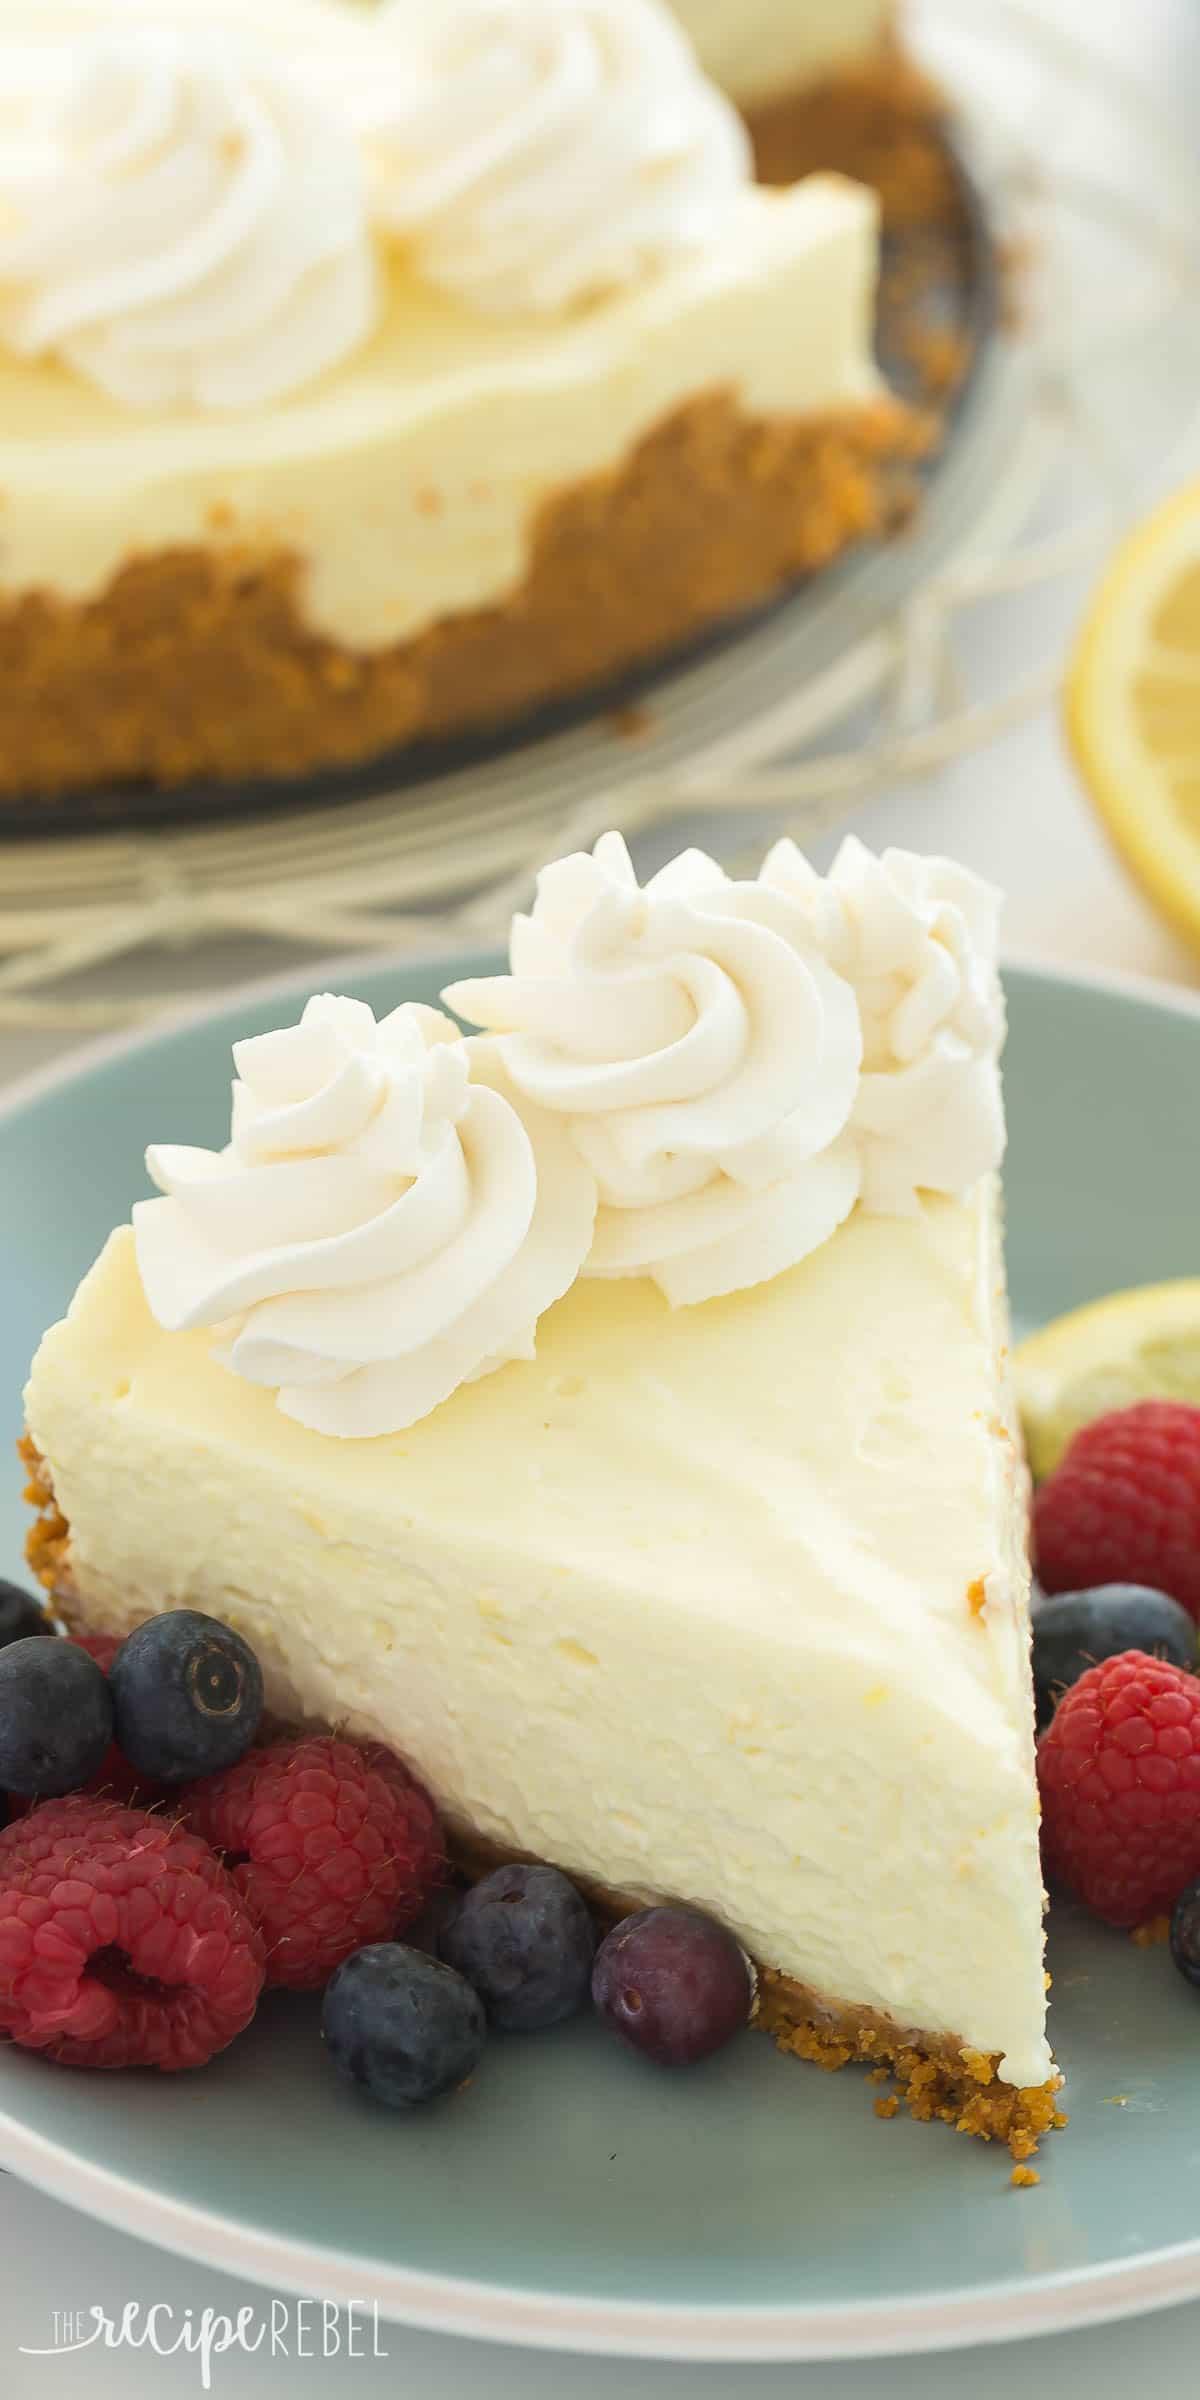 Cheesecake Recipe No Bake  Real Deal No Bake Lemon Cheesecake Recipe VIDEO